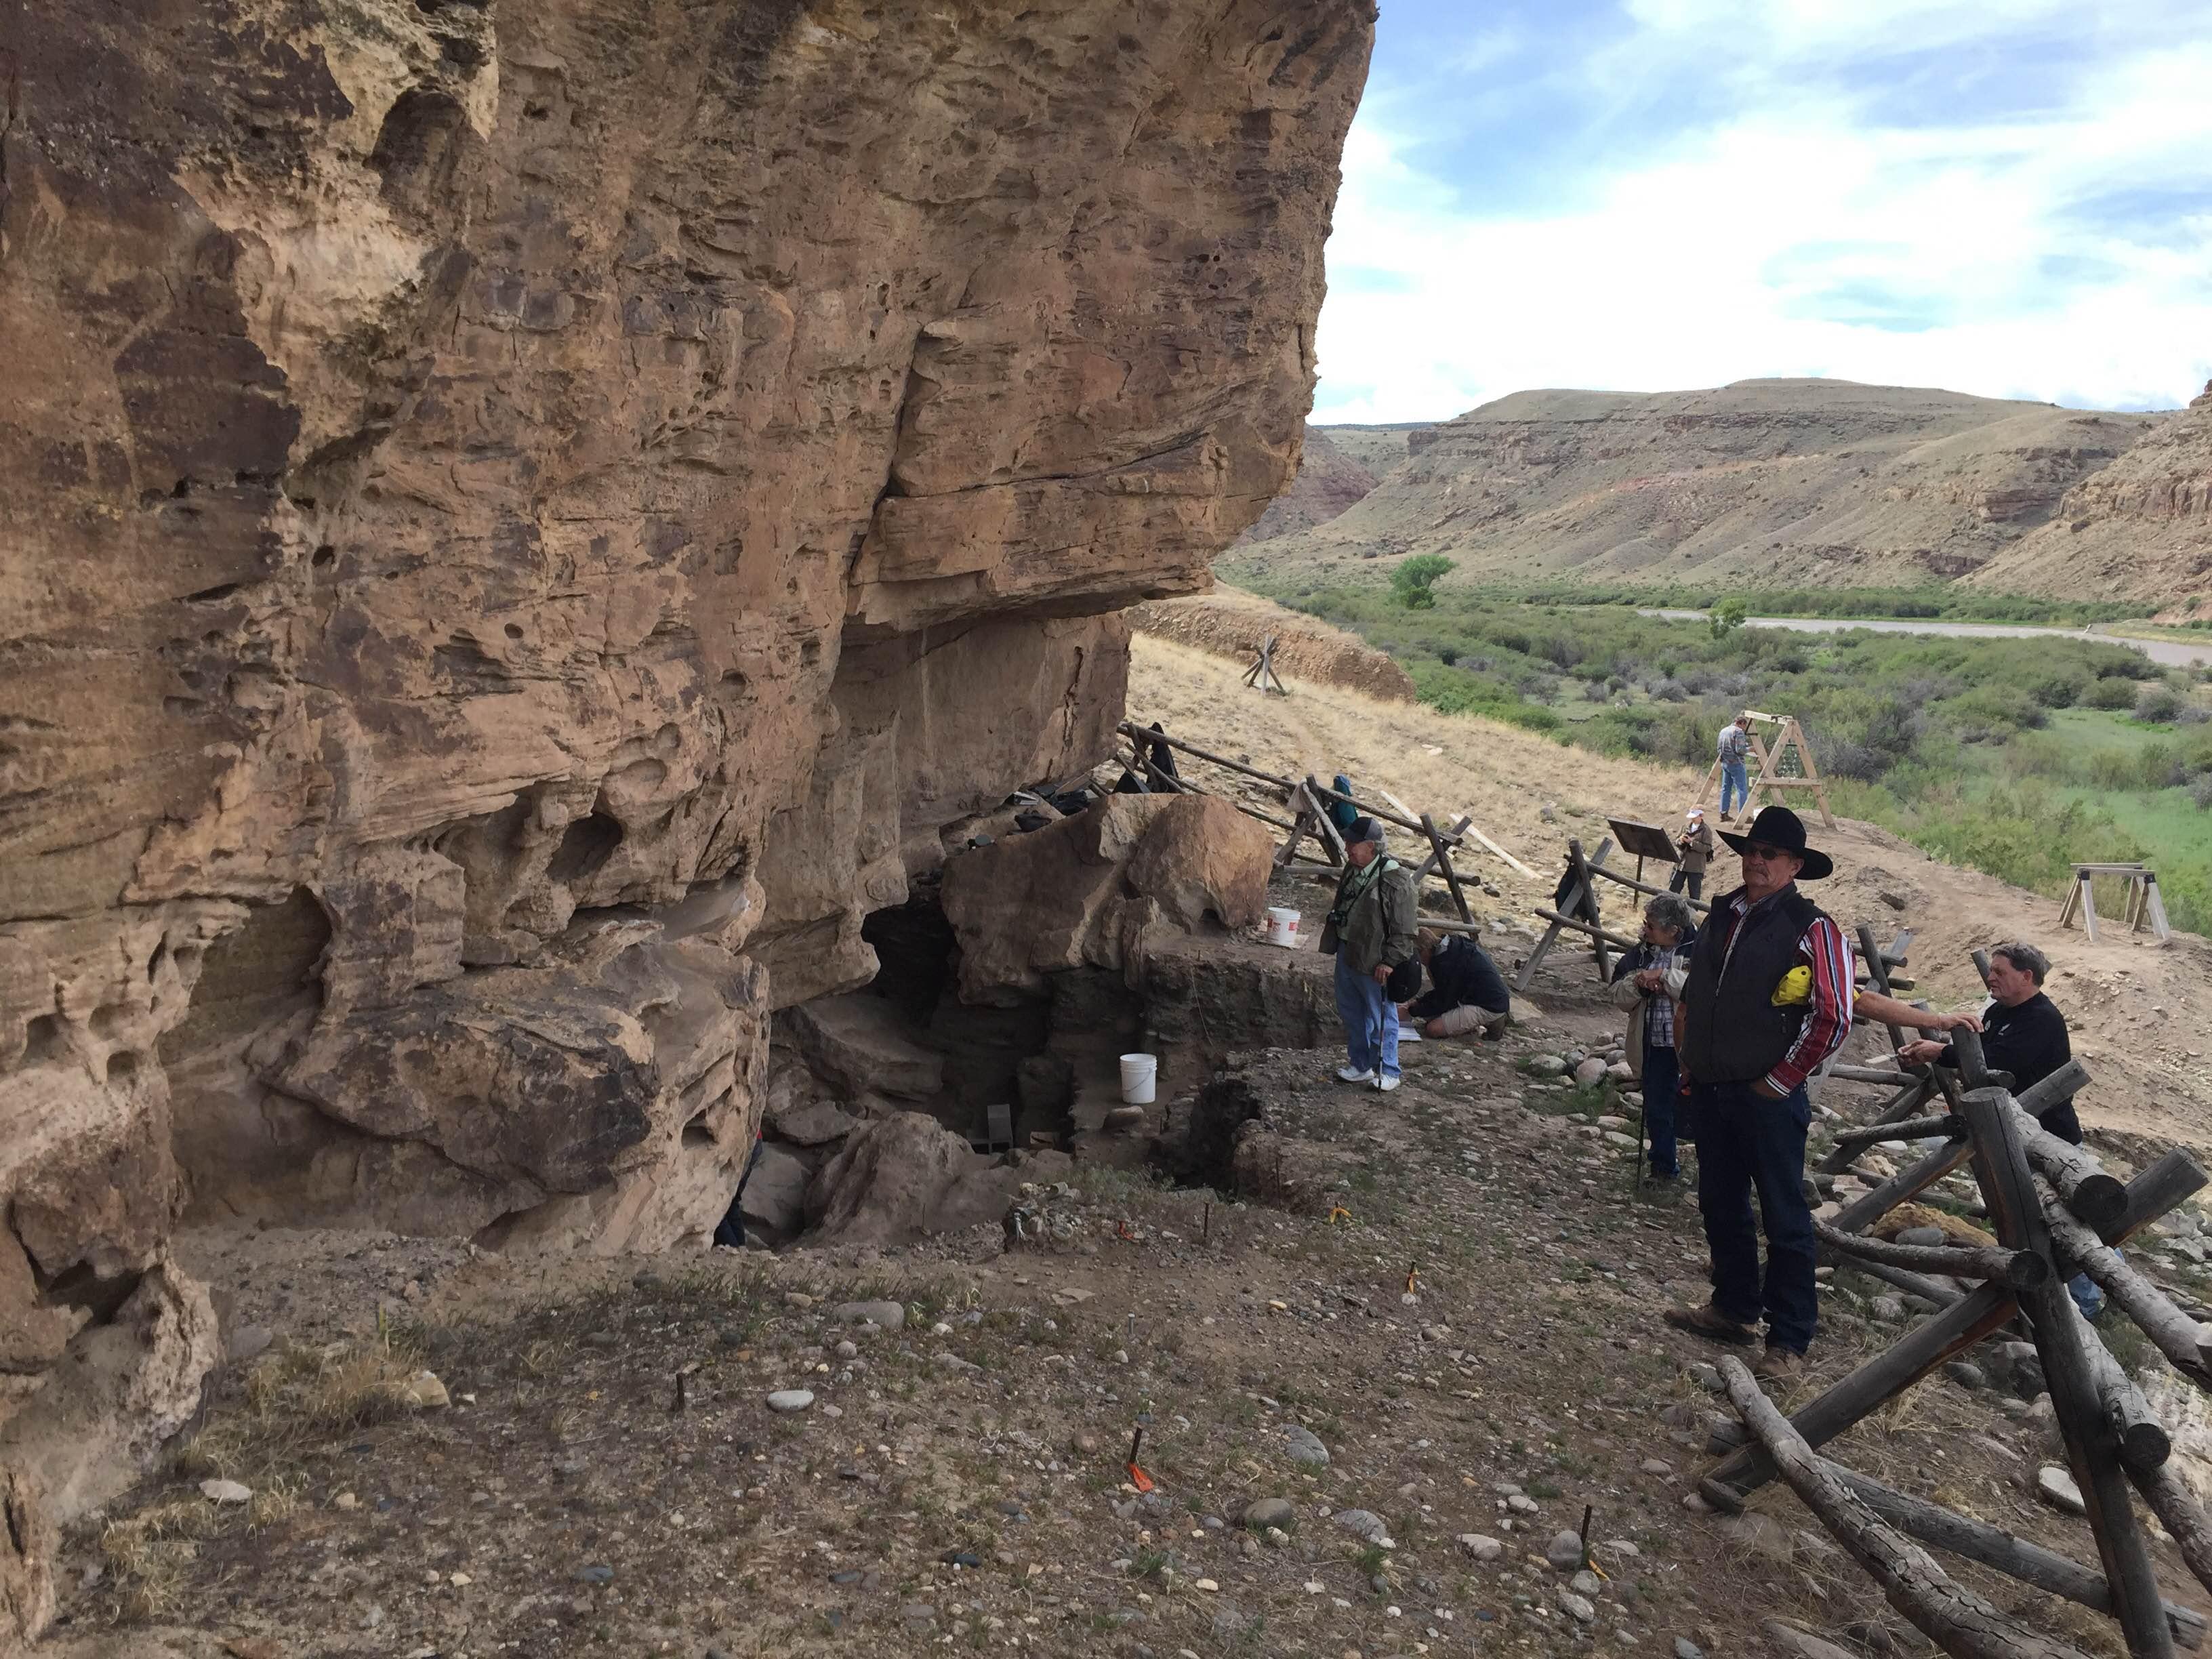 Eagle Rock Shelter Colorado History